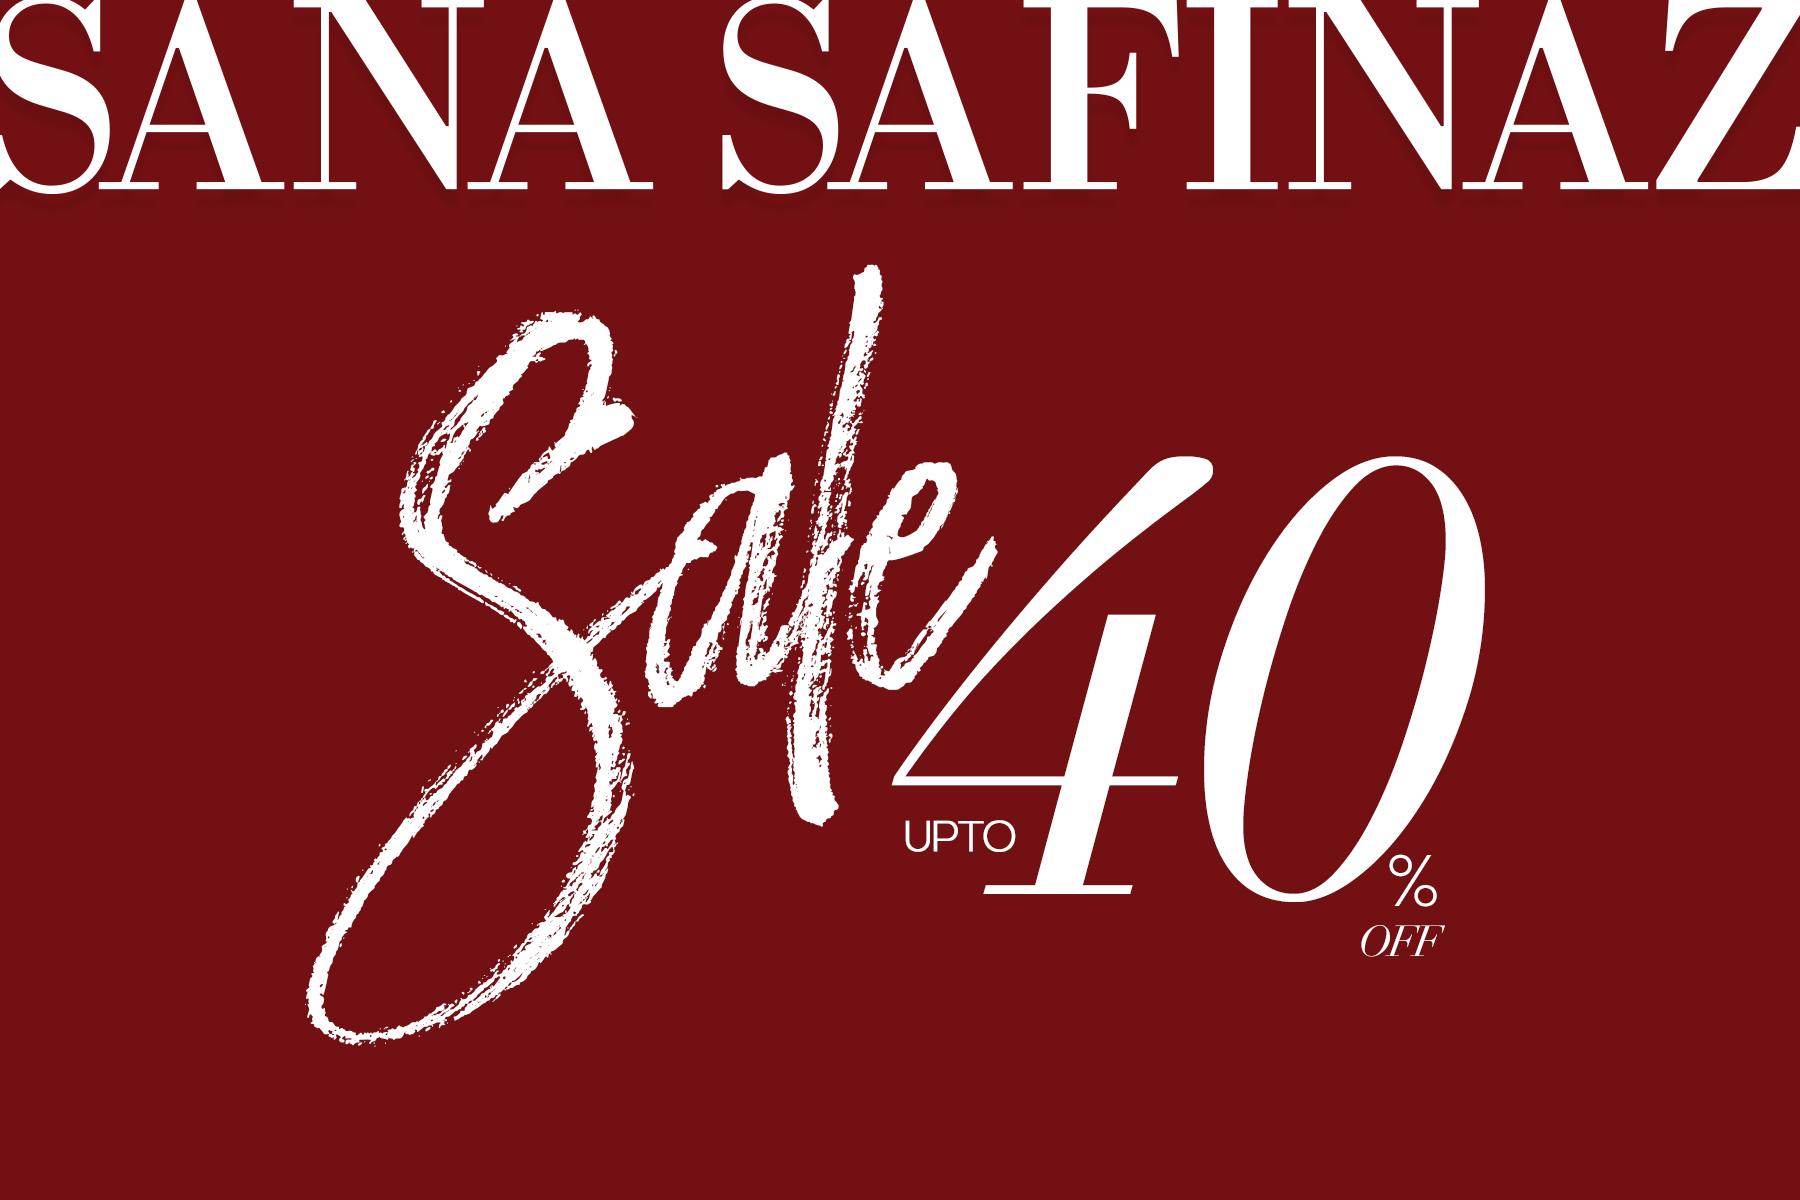 Sana Safinaz - SALE